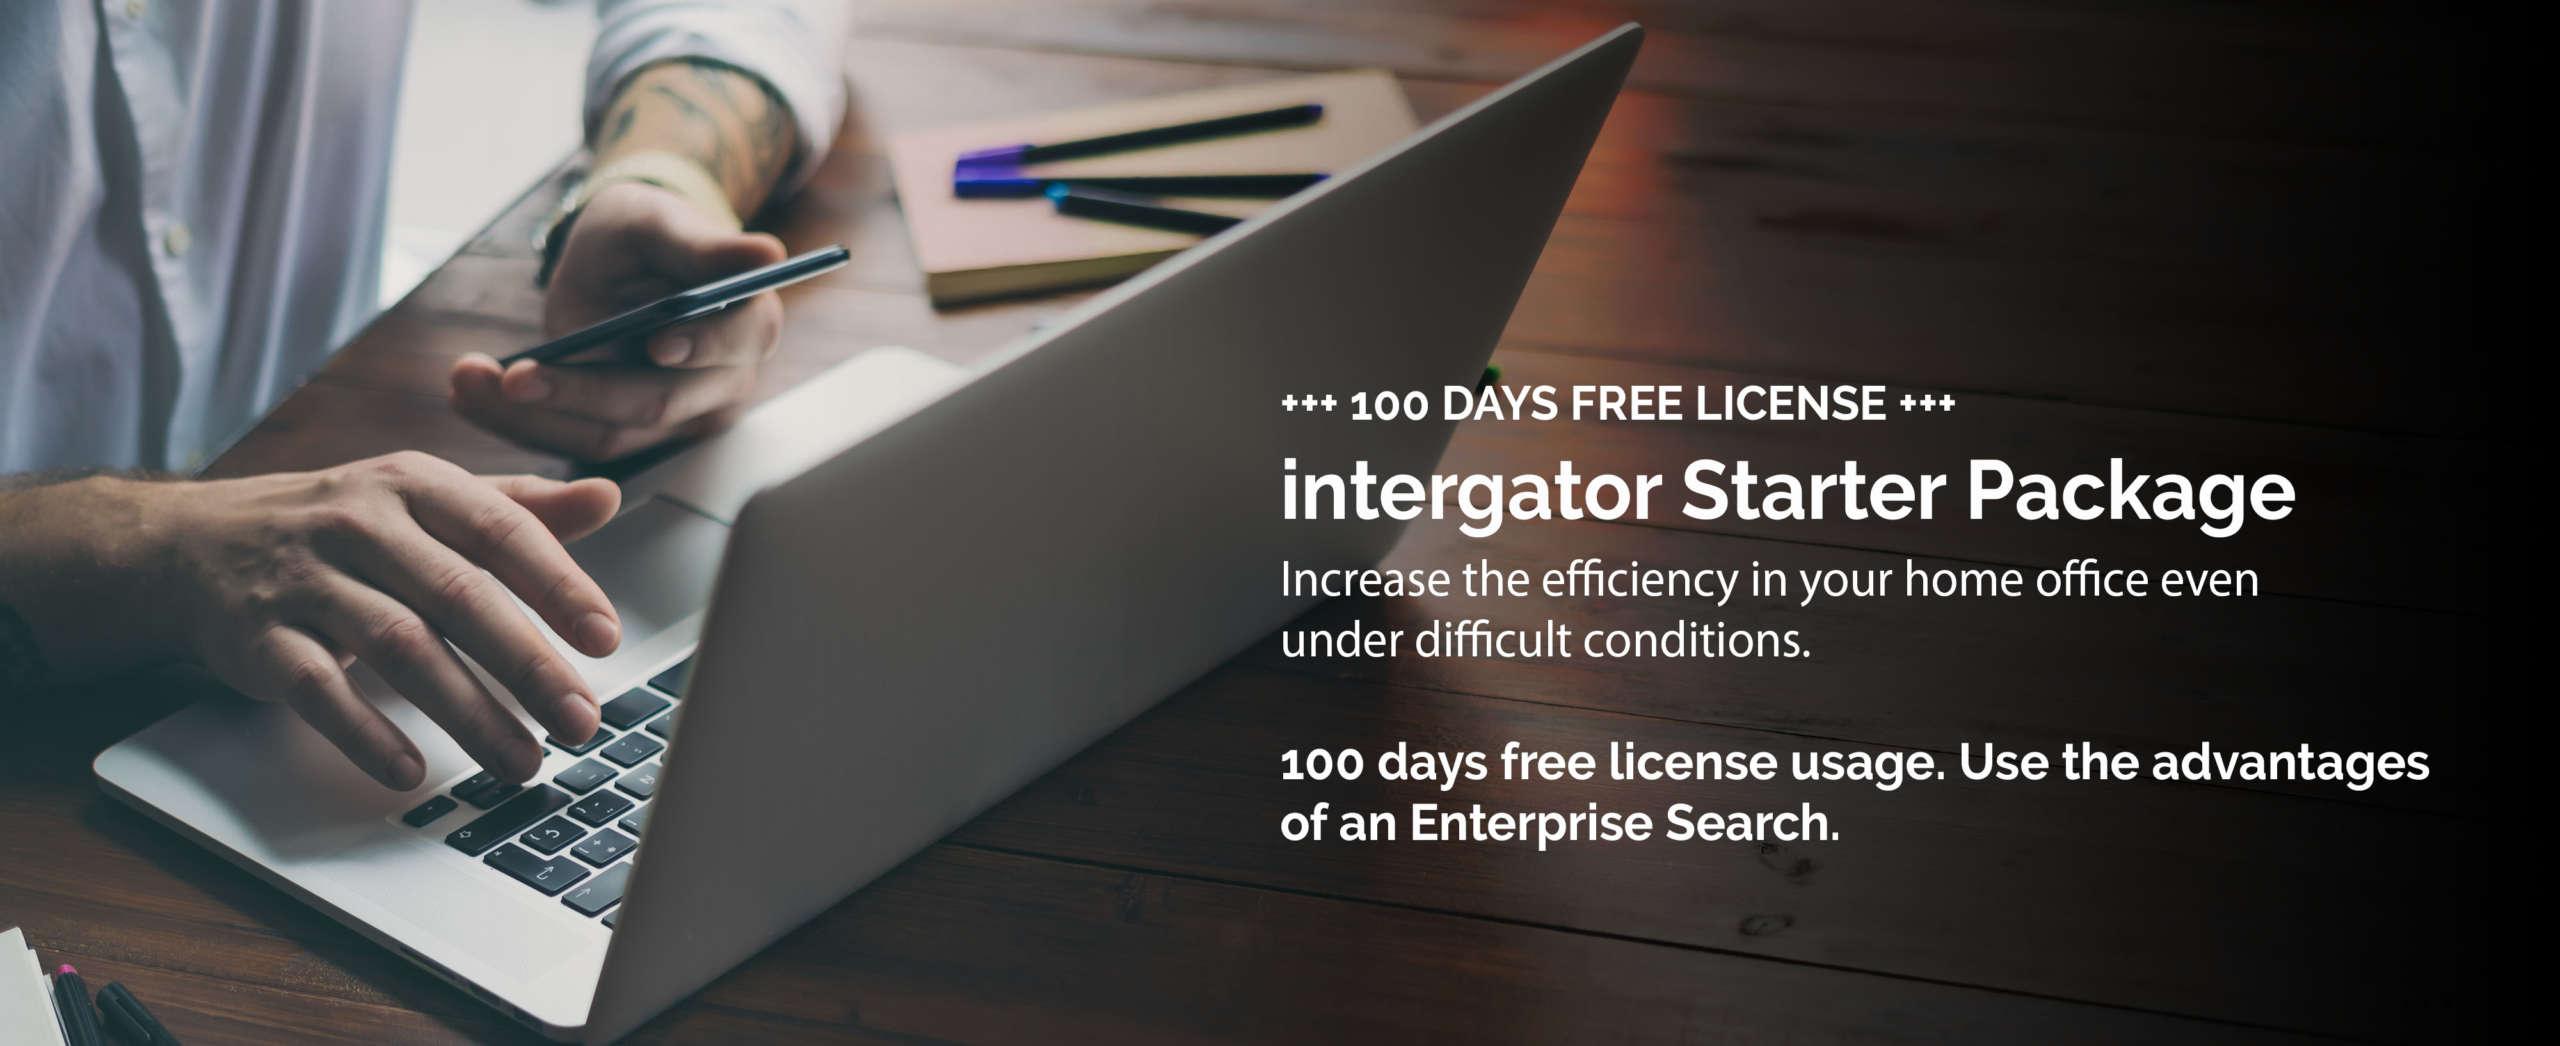 intergator Starter Package